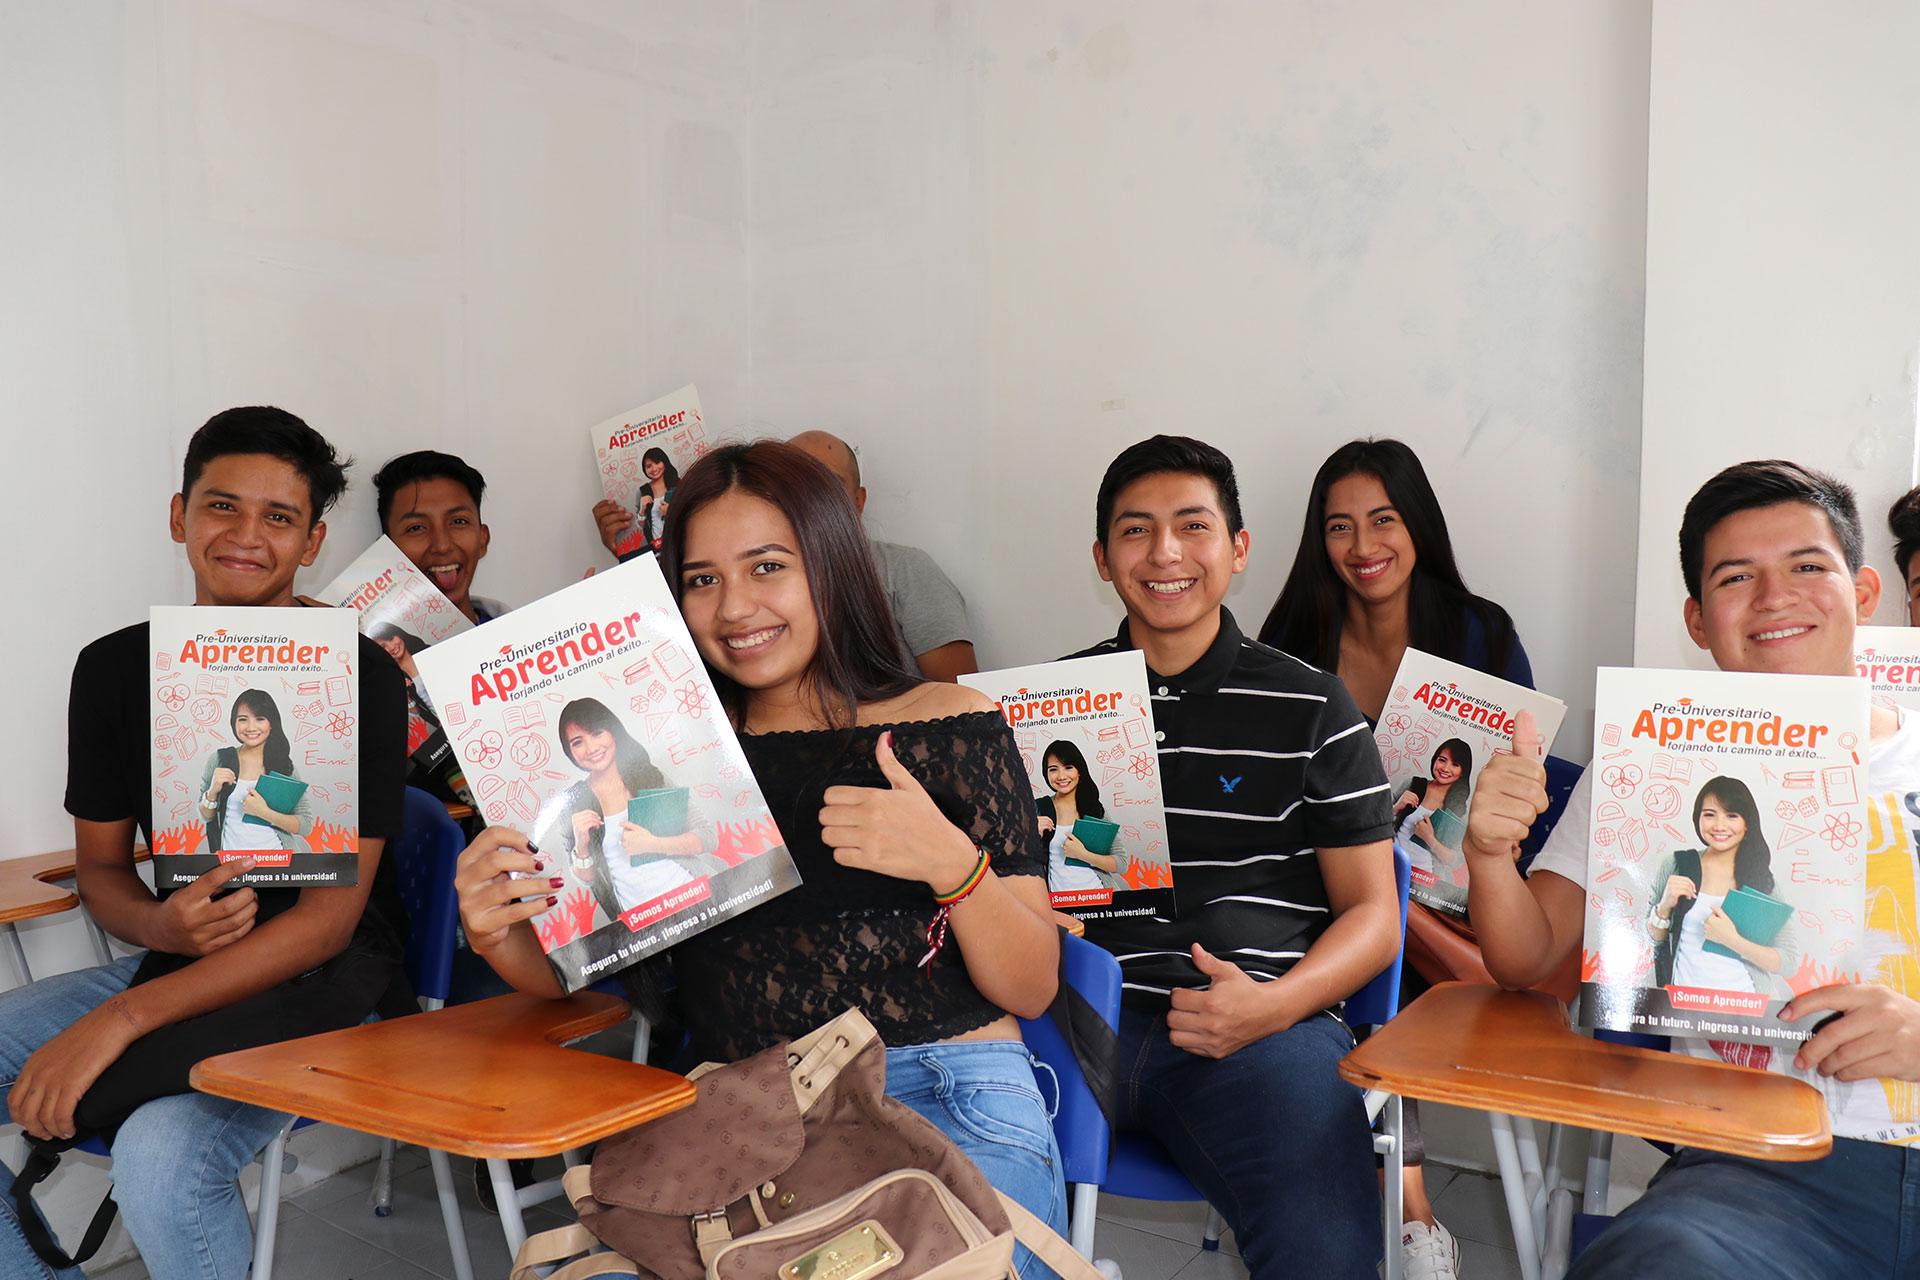 preuniversitario-aprender-alumnos con folleto-santo-domingo